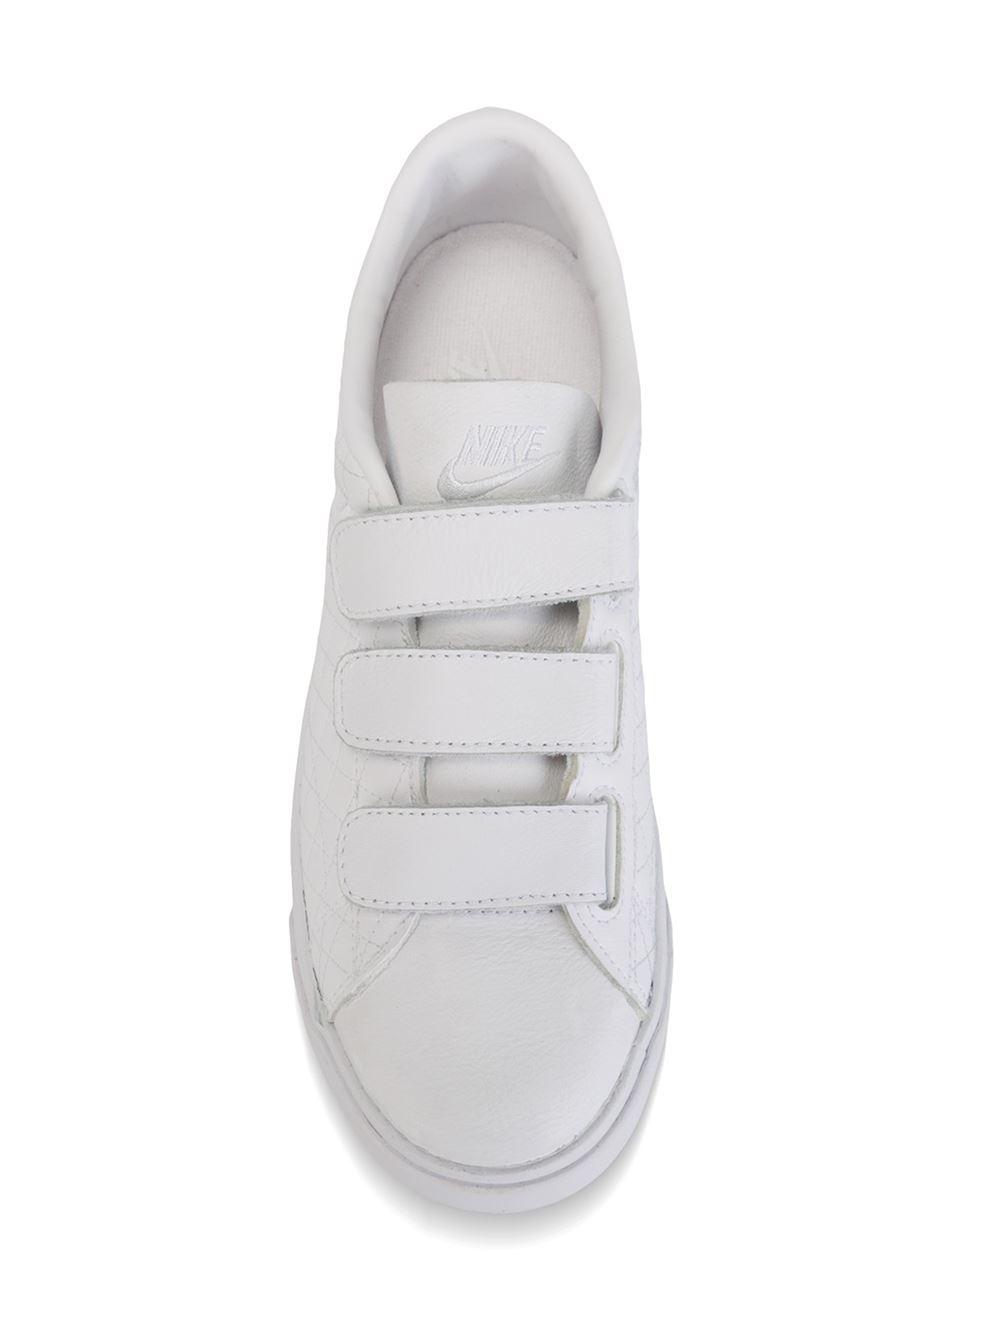 Lyst Low Tennis Men Ac In Top For Sneakers Classic Nike White V 1f1wxXr6q 14d7048b34b